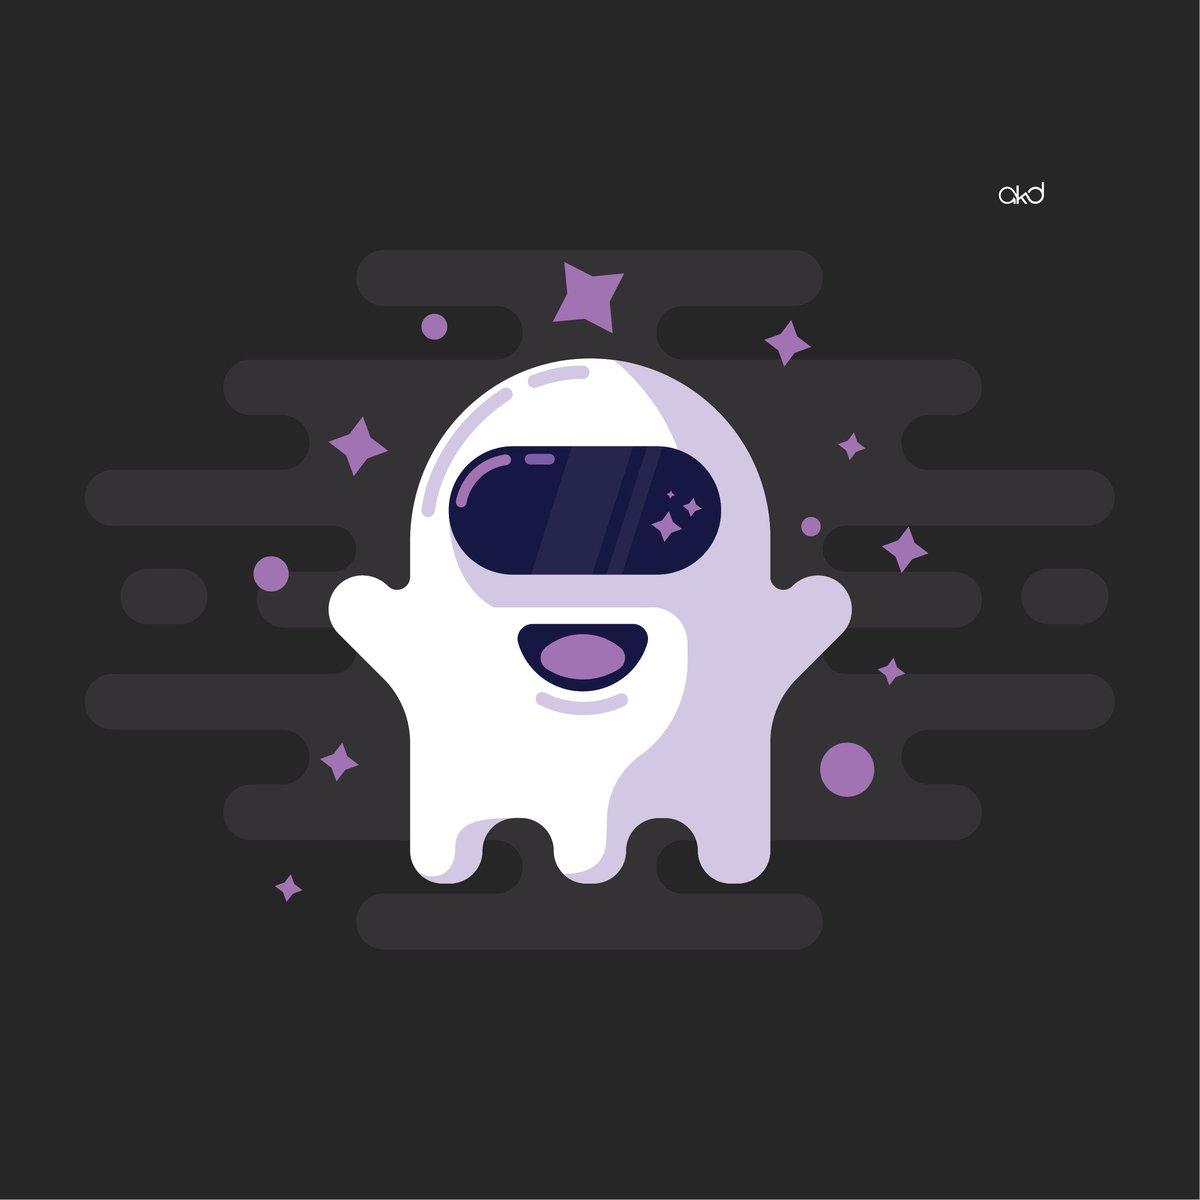 2d Illustration . . . #2danimation #2dillustration #design #logodesigns #logo #designer #graphic #art #artist #adobe #adobeillustrator #logotype #pet #pets #animal #logodesigner #logodesigns #identydesign #photoshop #illustrator #illustration #instagram https://t.co/q1XPDtqTRK